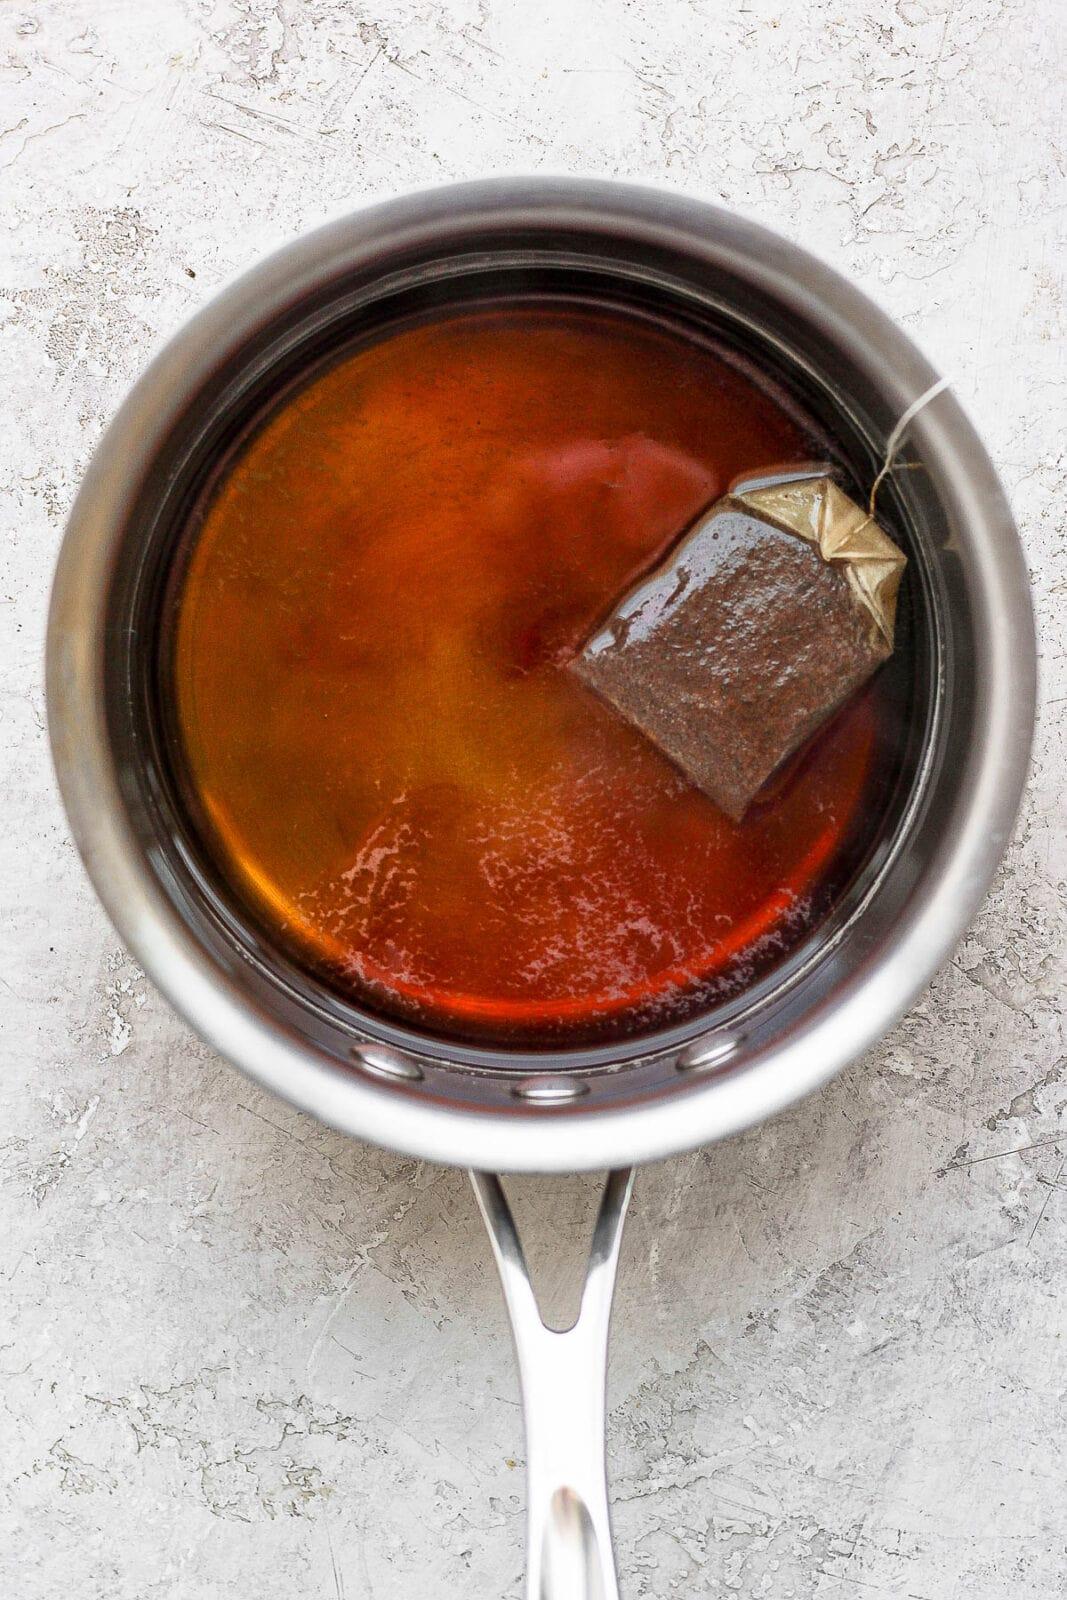 Earl Grey tea being steeped in a saucepan of hot water.